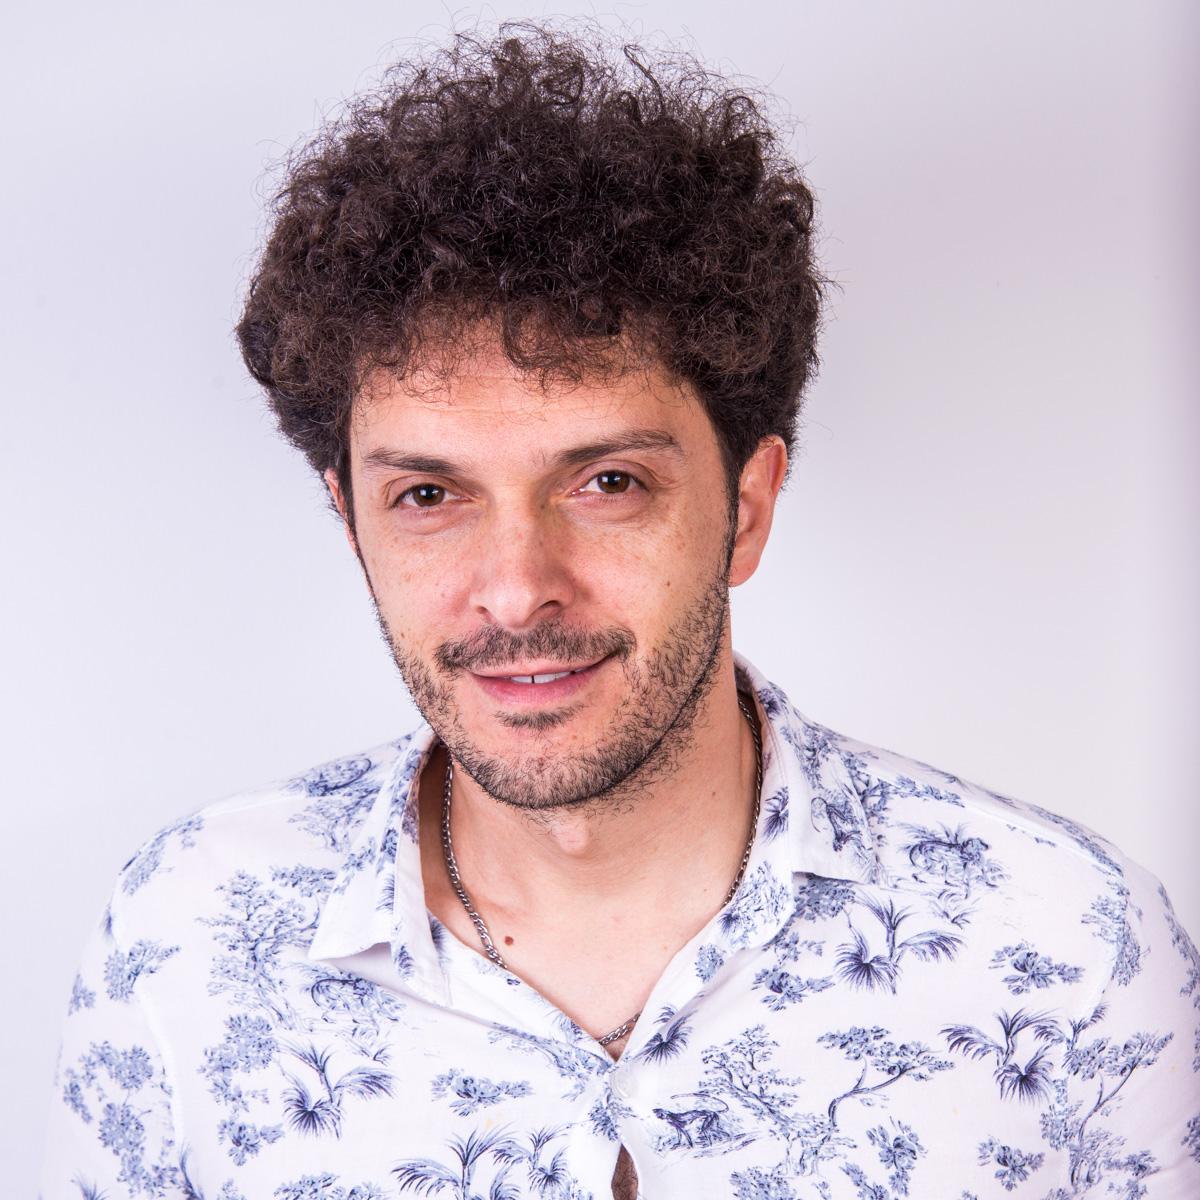 Mario Menechelli